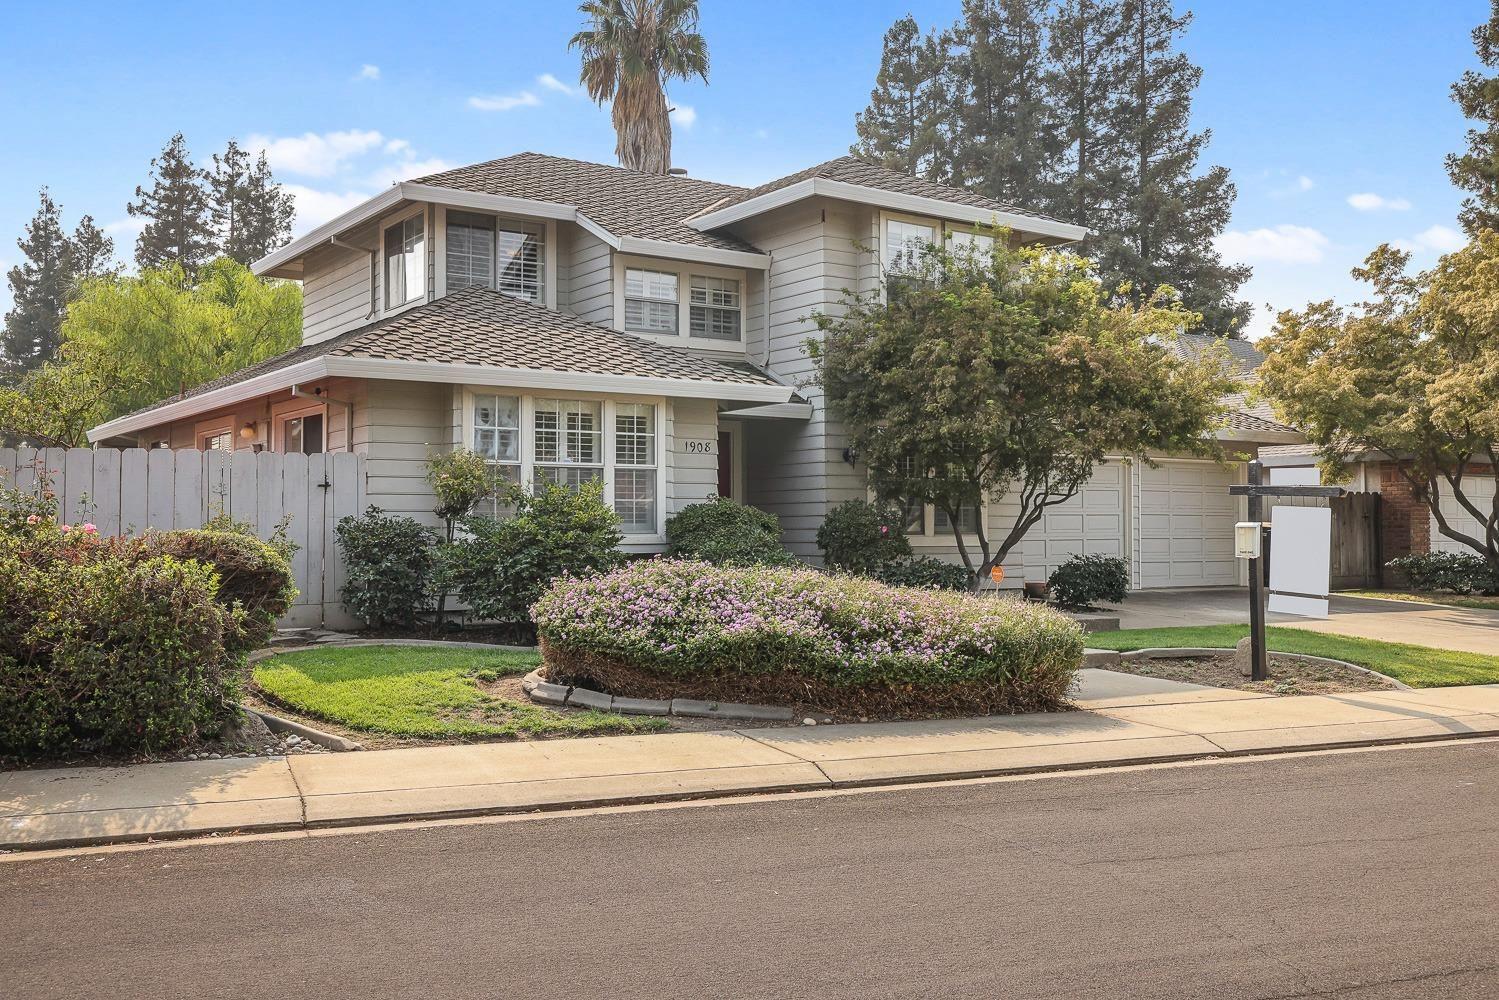 1908 Lakeshore Drive, Modesto, CA 95355 - MLS#: 221129218